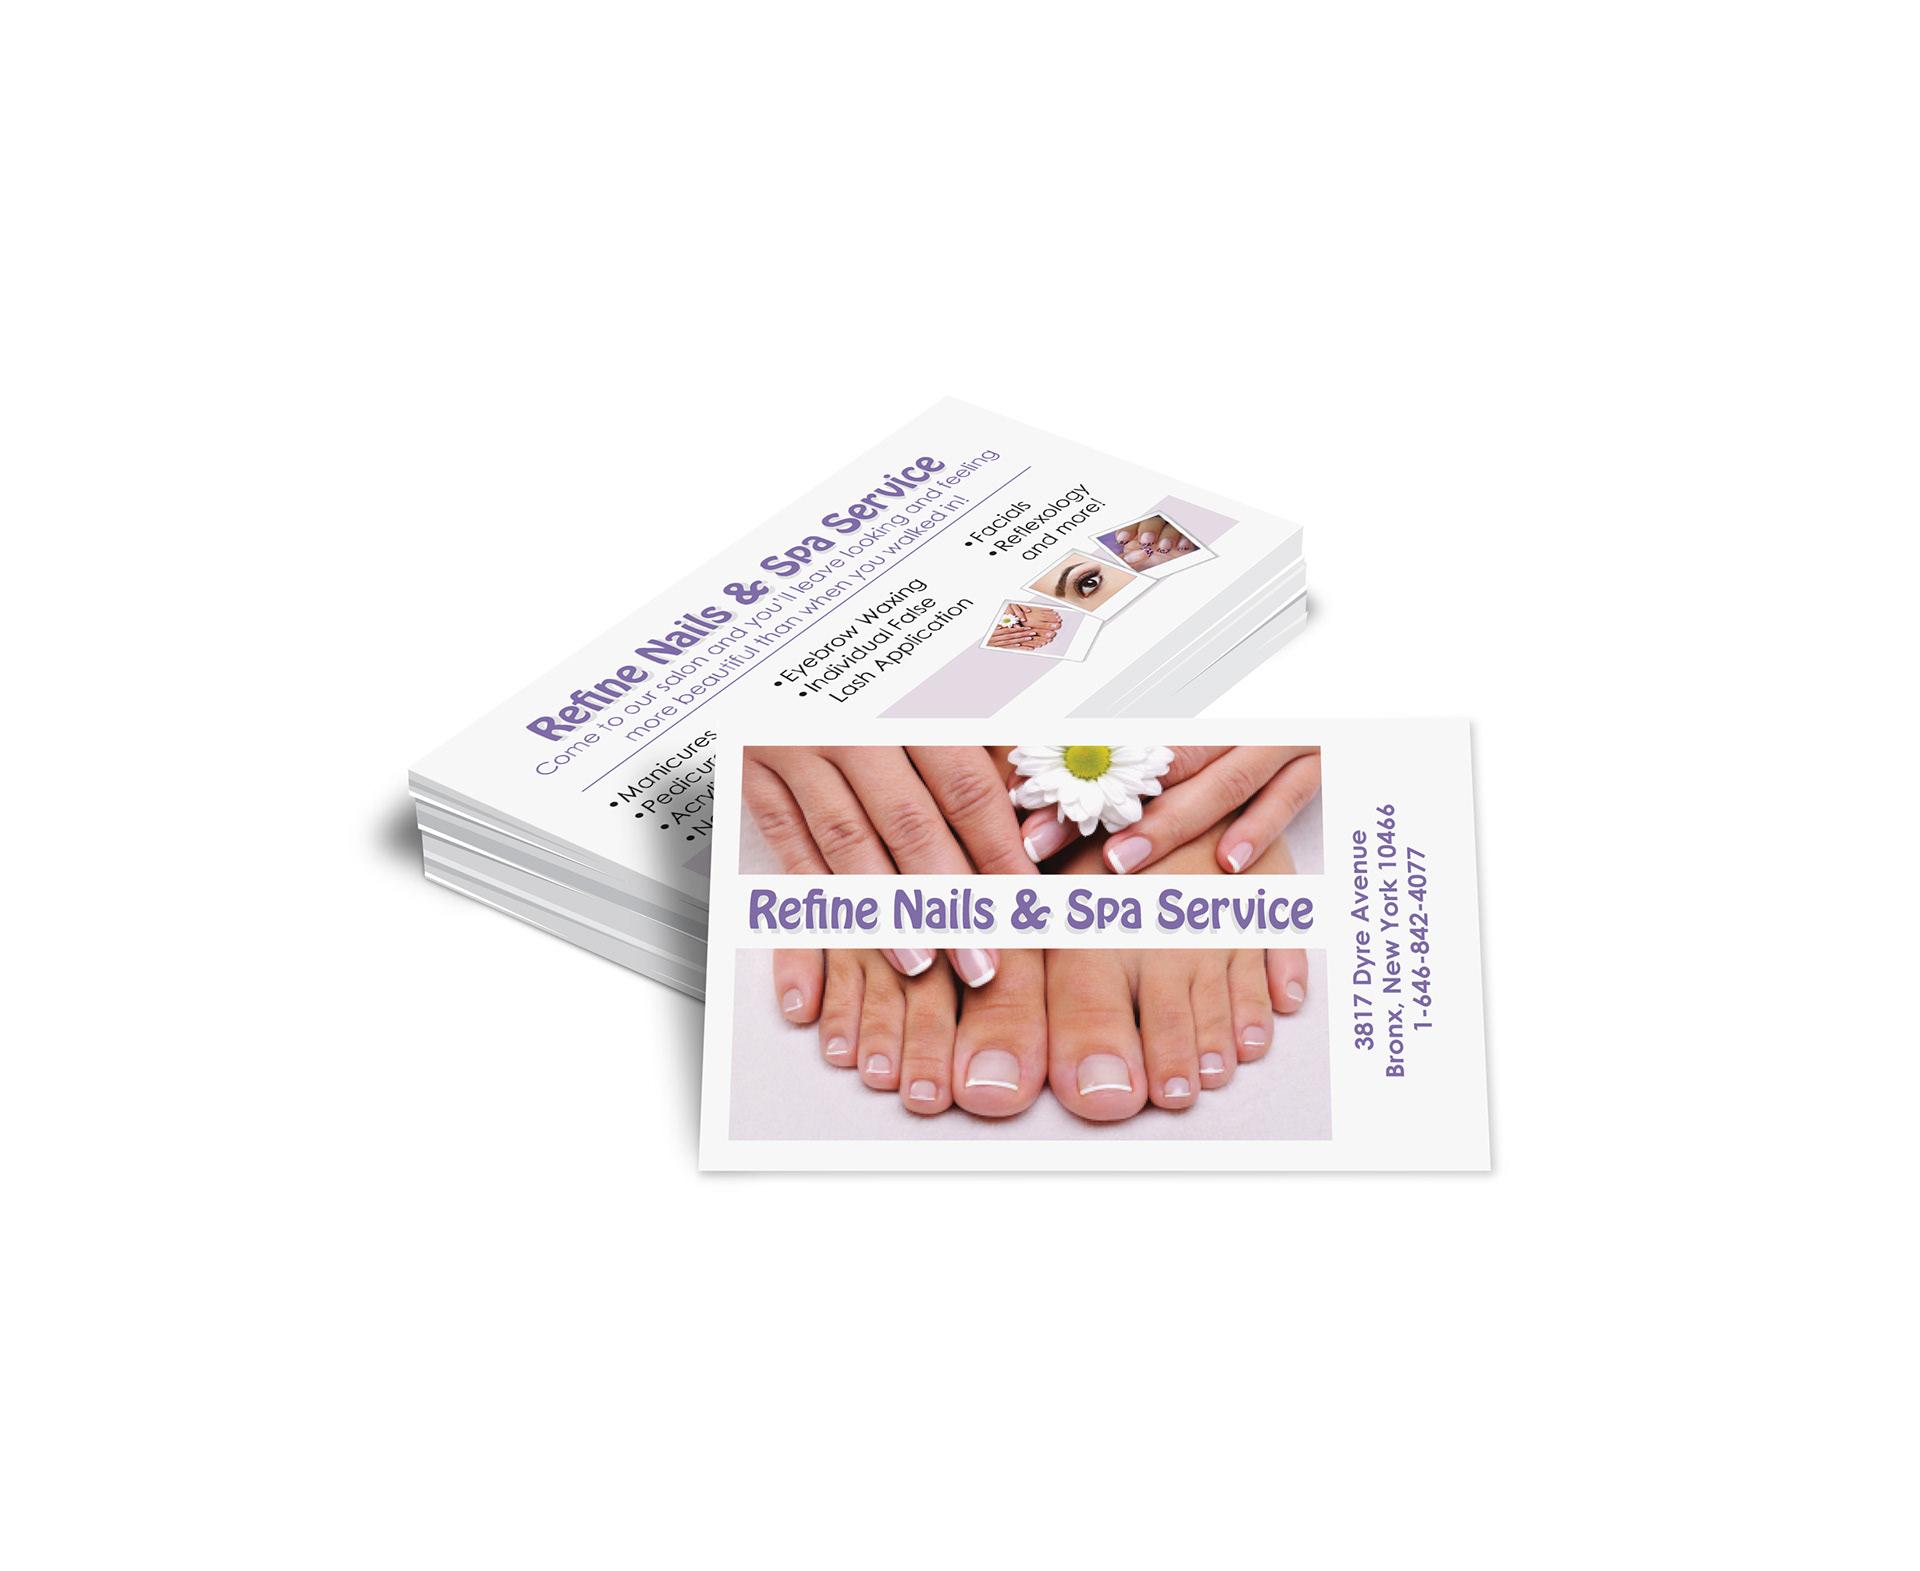 branded GRAPHICS - Refine Nails & Spa Service